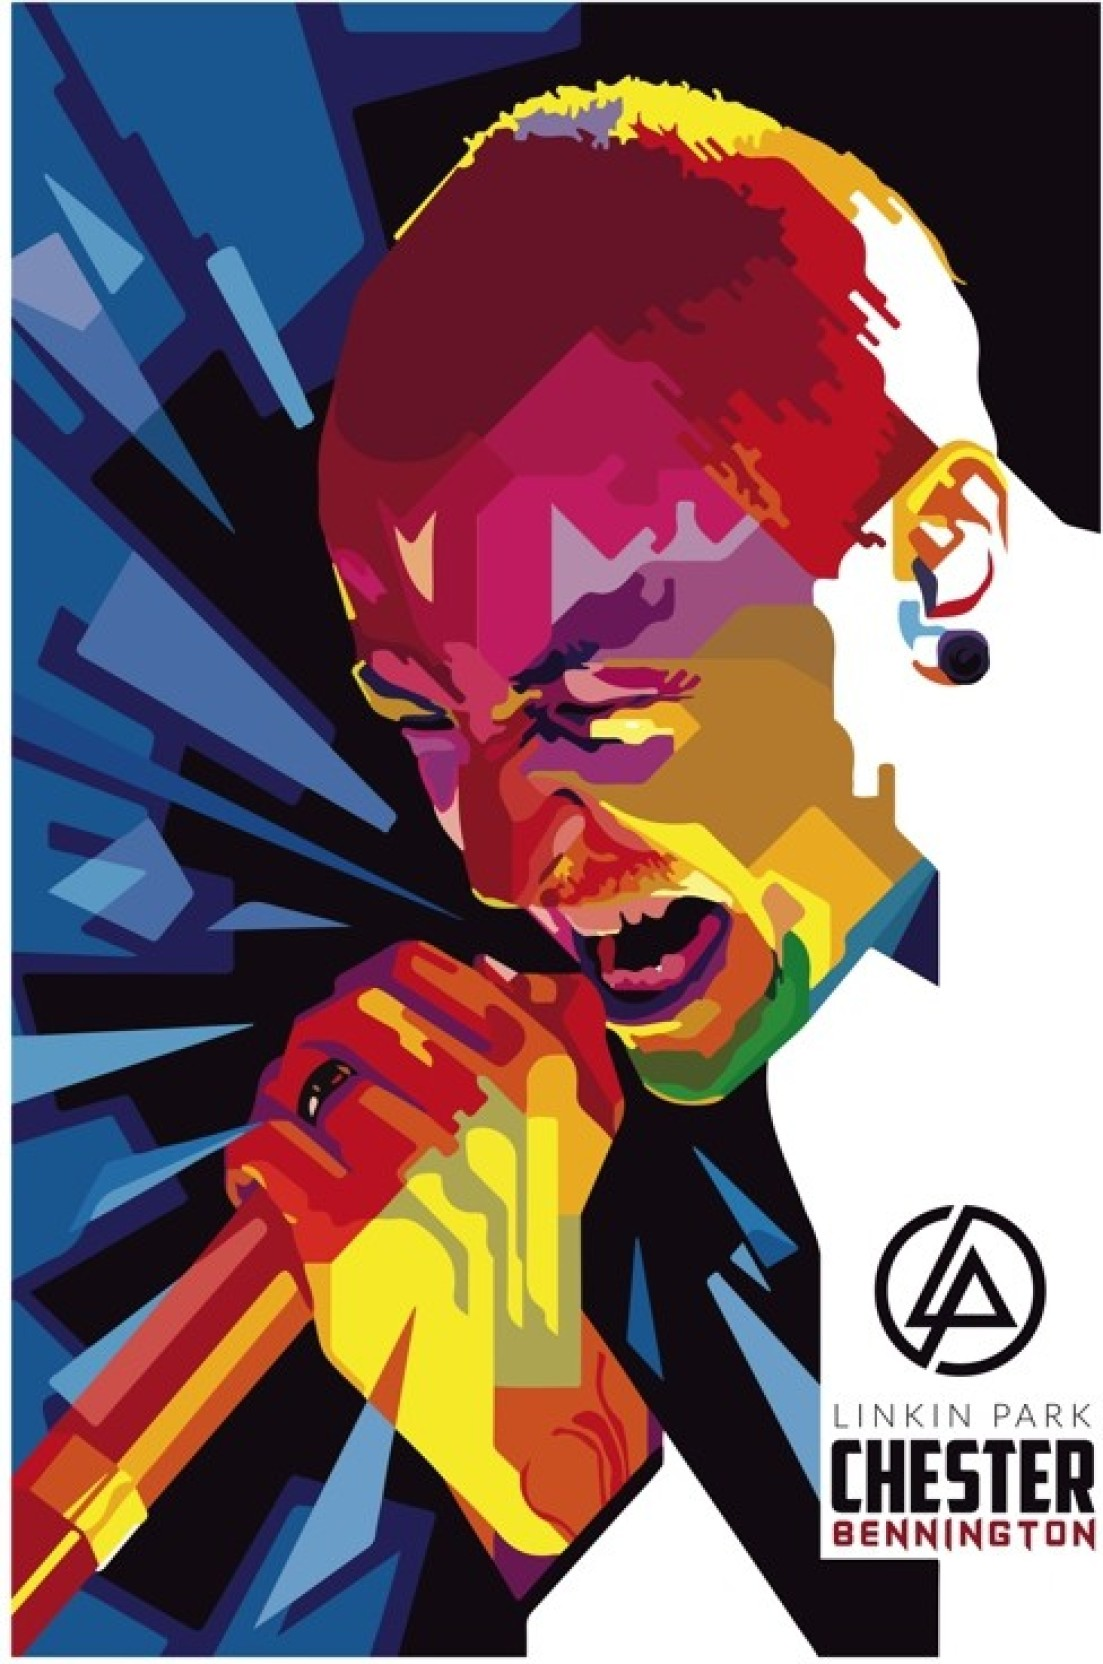 Chester Bennington Linkin Park Music Illustration Poster